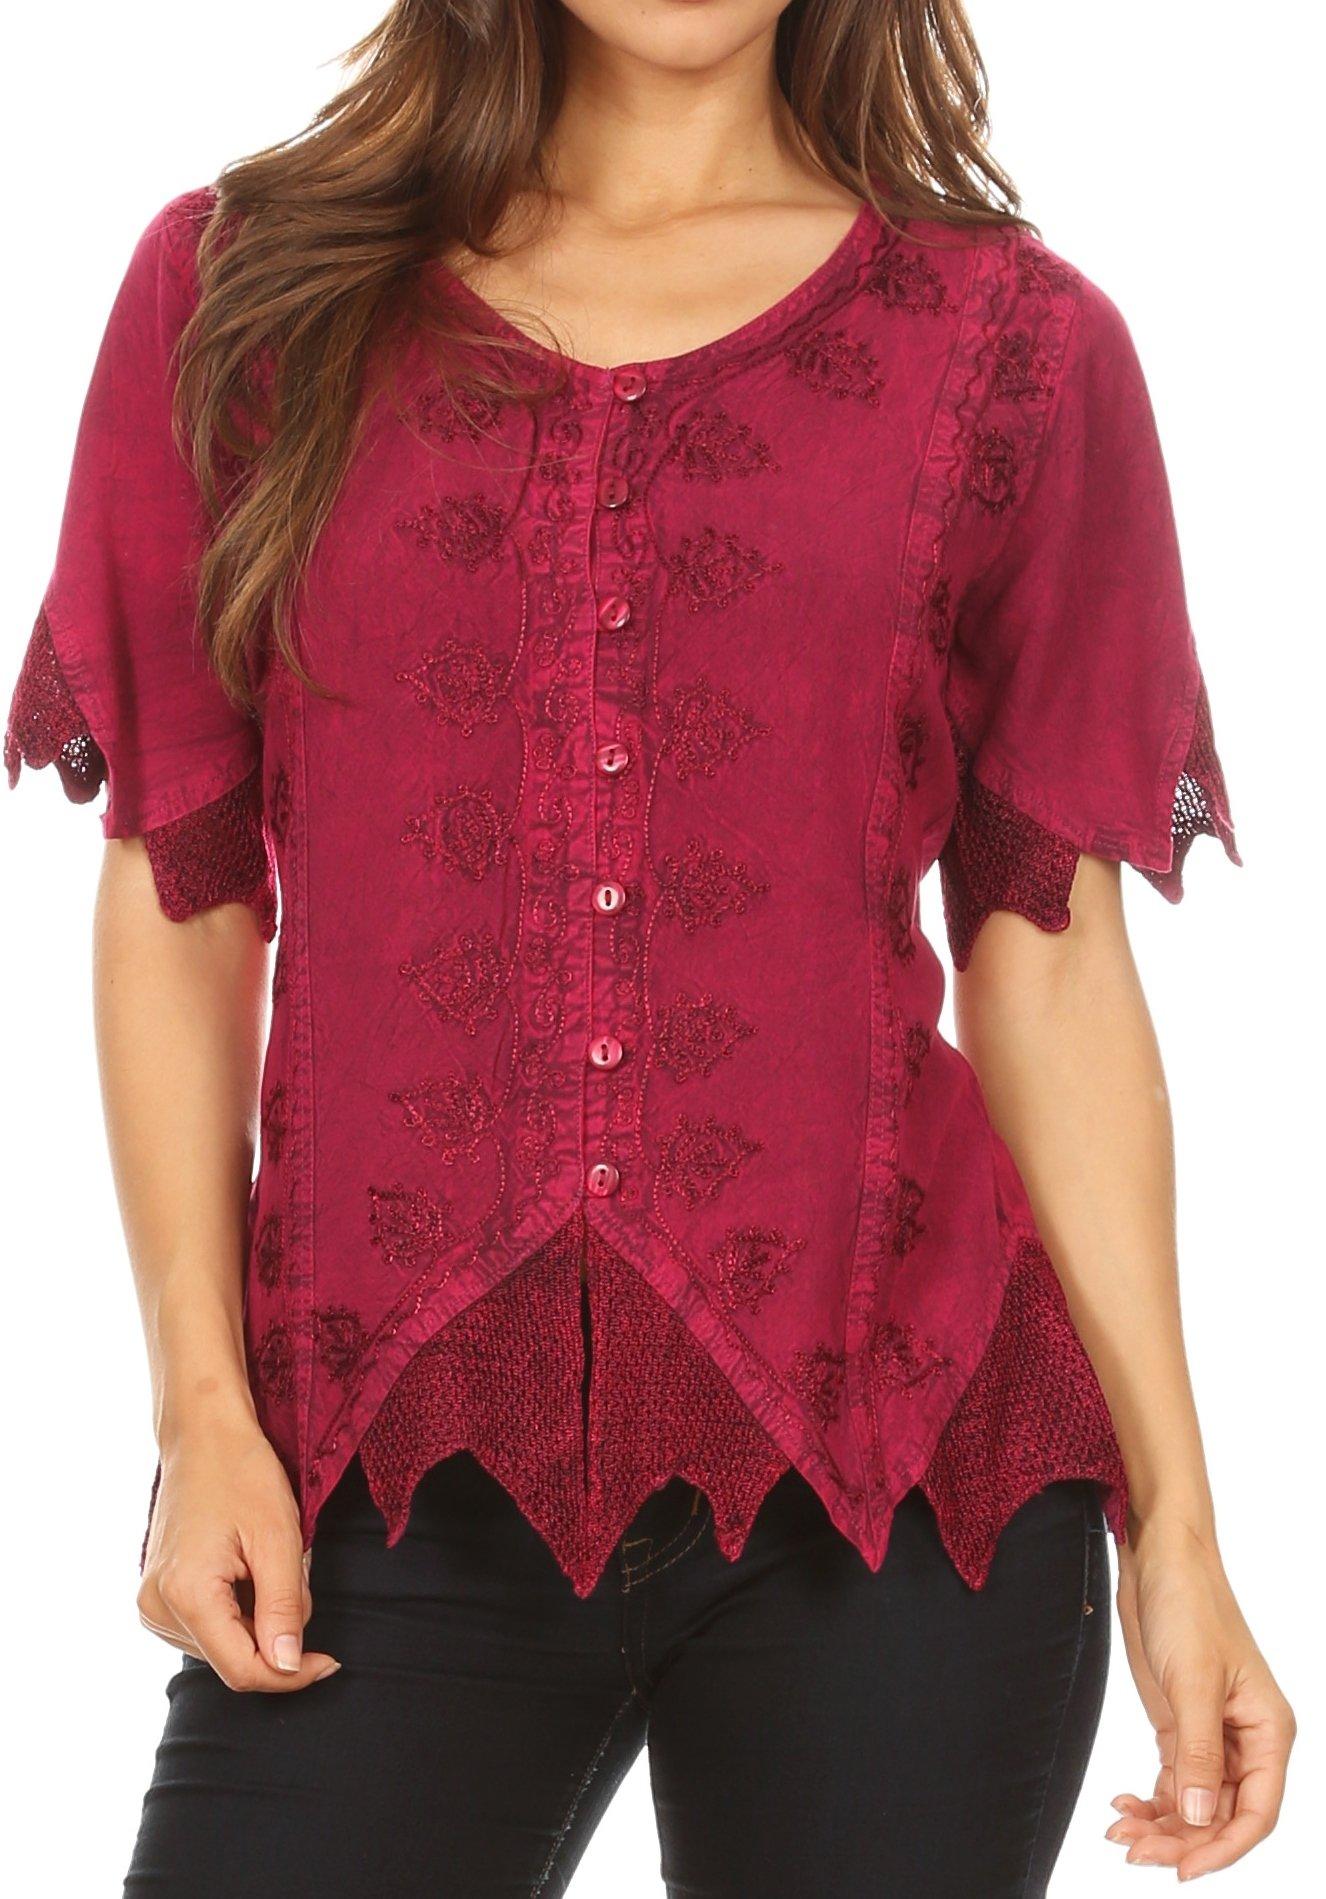 Sakkas 1668 - Emma Womens Stonewashed V Neck Short Sleeve Blouse Top Crochet Button Down - Fuschia - XXL